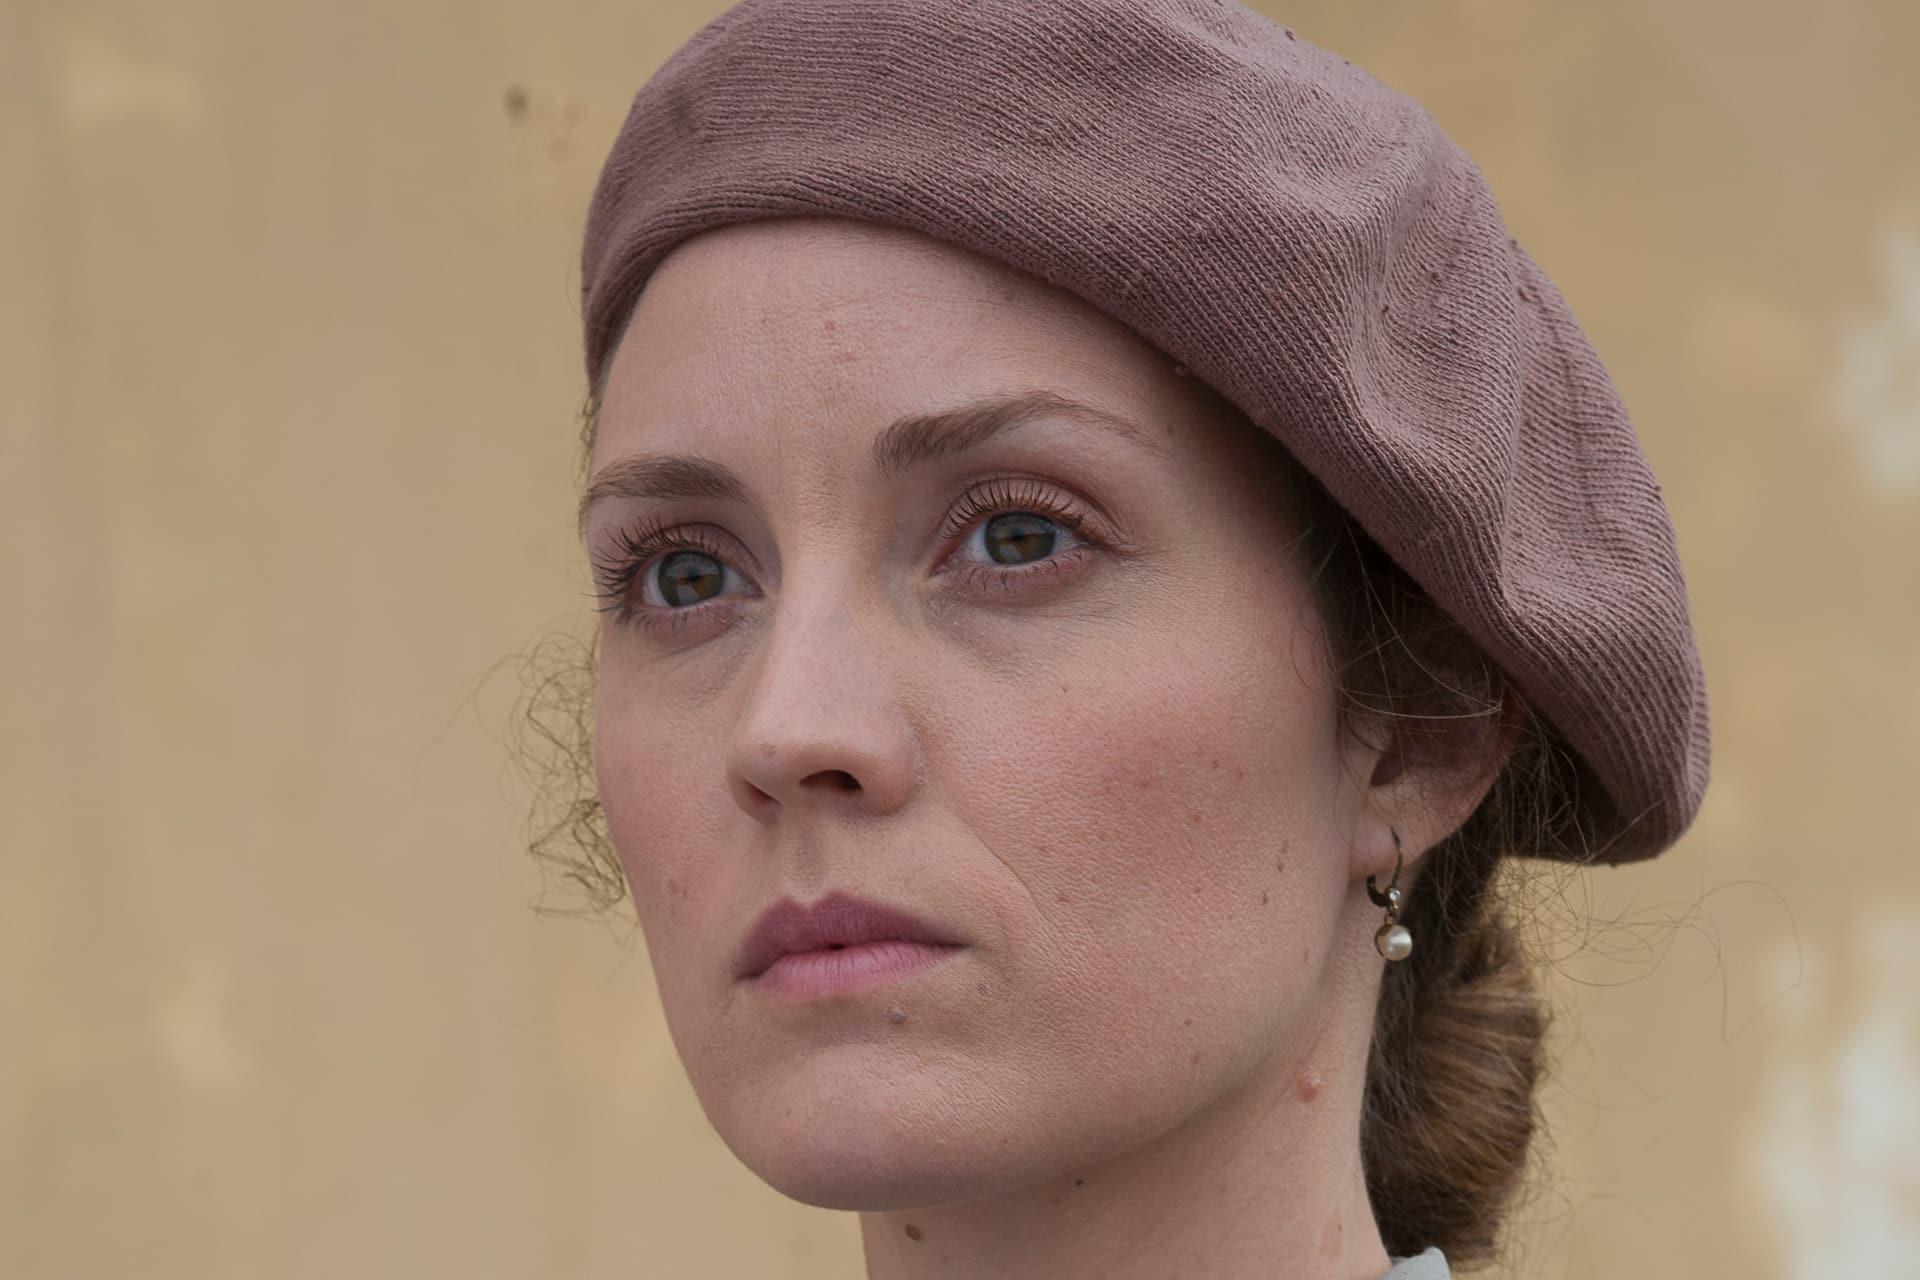 Evelyne Brochu as Aurora.